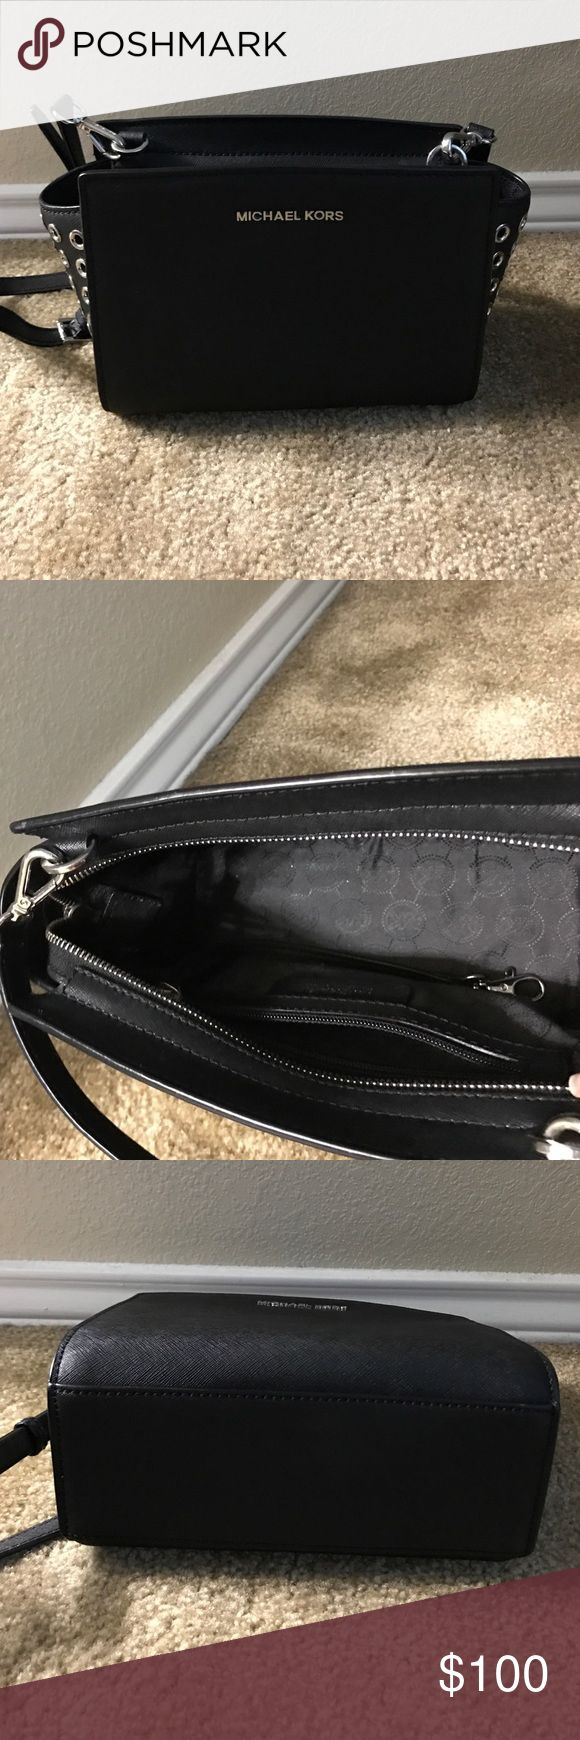 Michael Kors Selma handbag Micheal Kors 'Selma' small crossbody handbag. 100% Authentic great condition. Bags Crossbody Bags